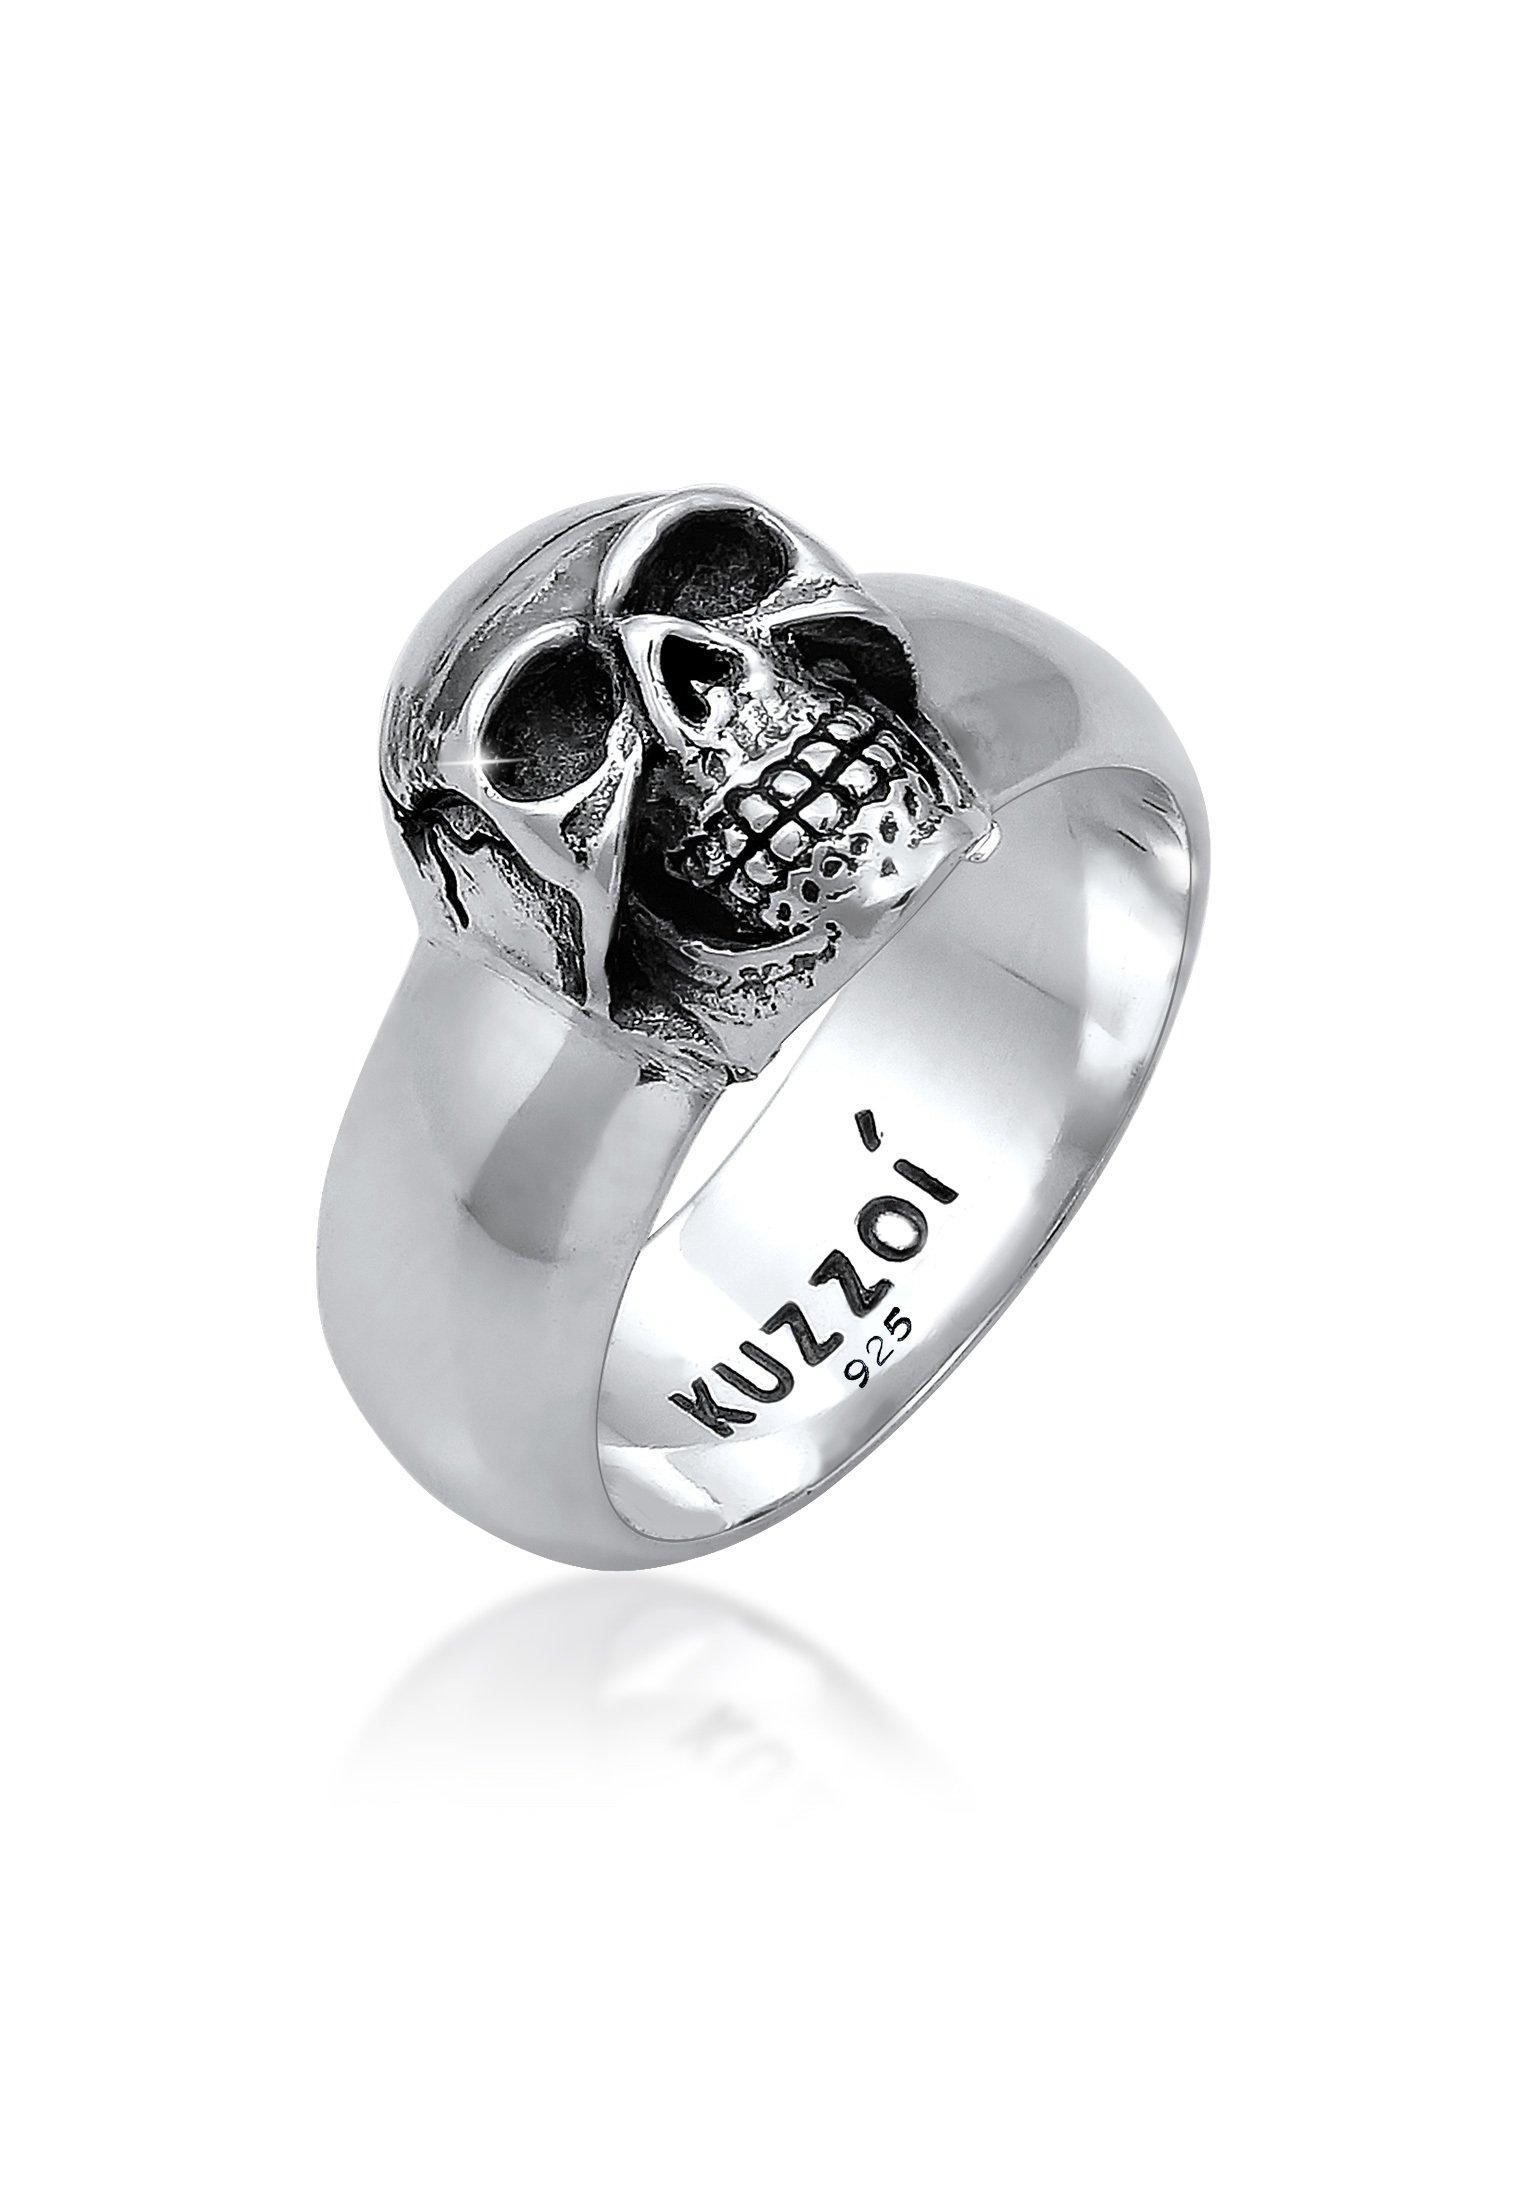 Kuzzoi Silberring Herren Siegelring Totenkopf Oxidiert 925er Silber